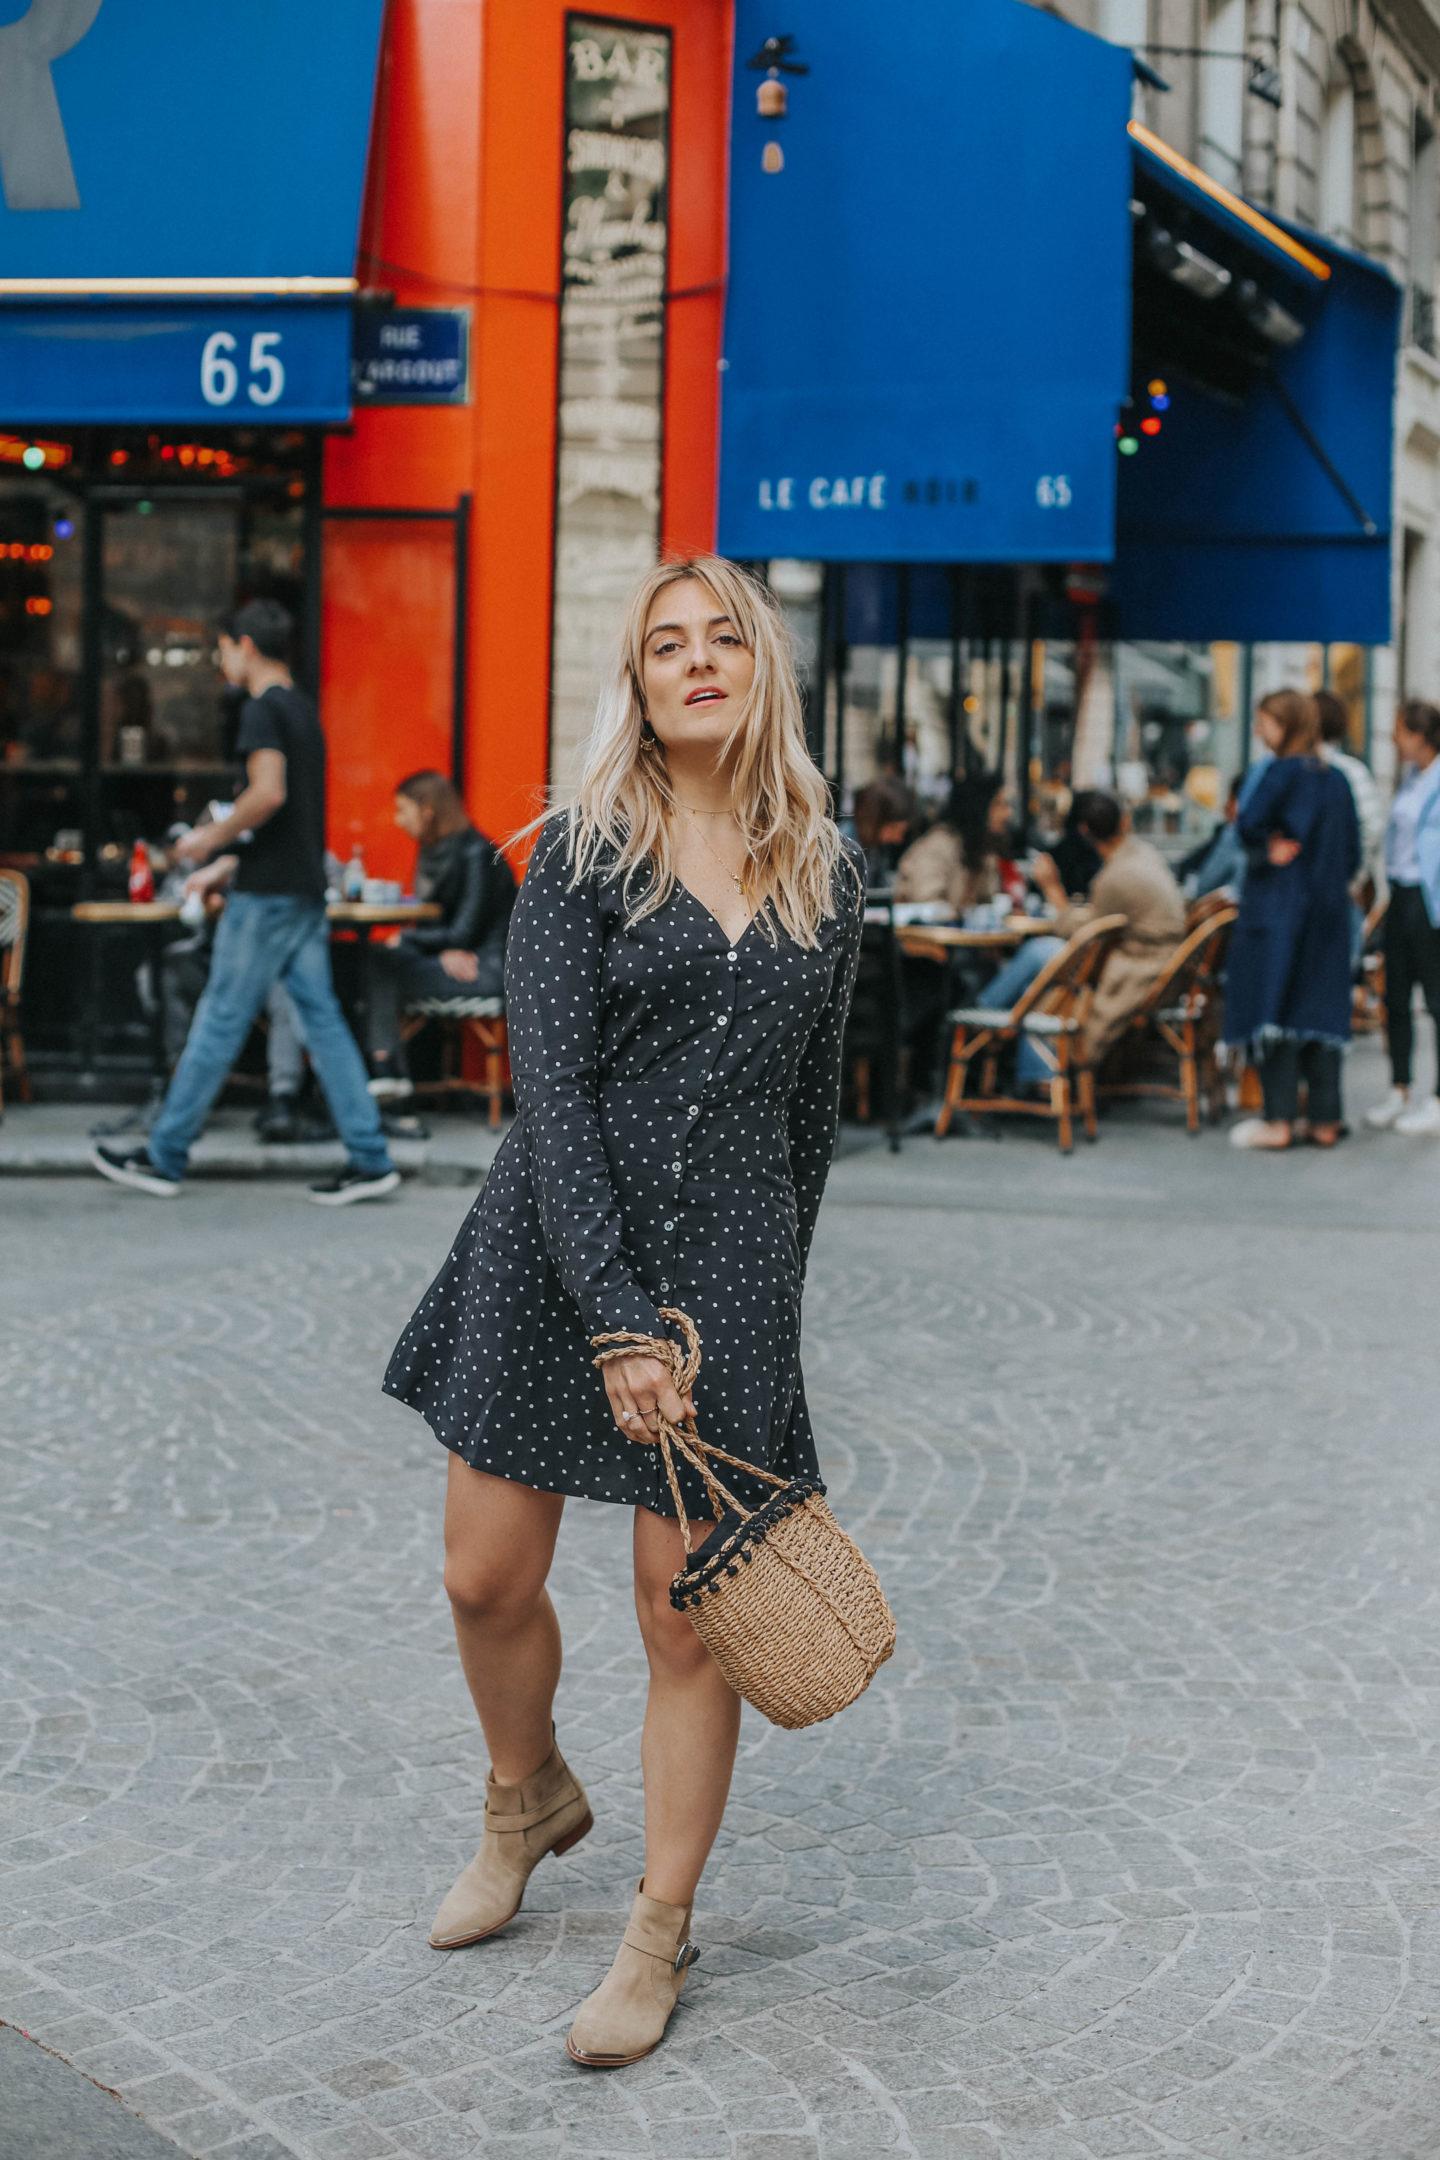 Boots IKKS - Blondie Baby blog mode Paris et voyages